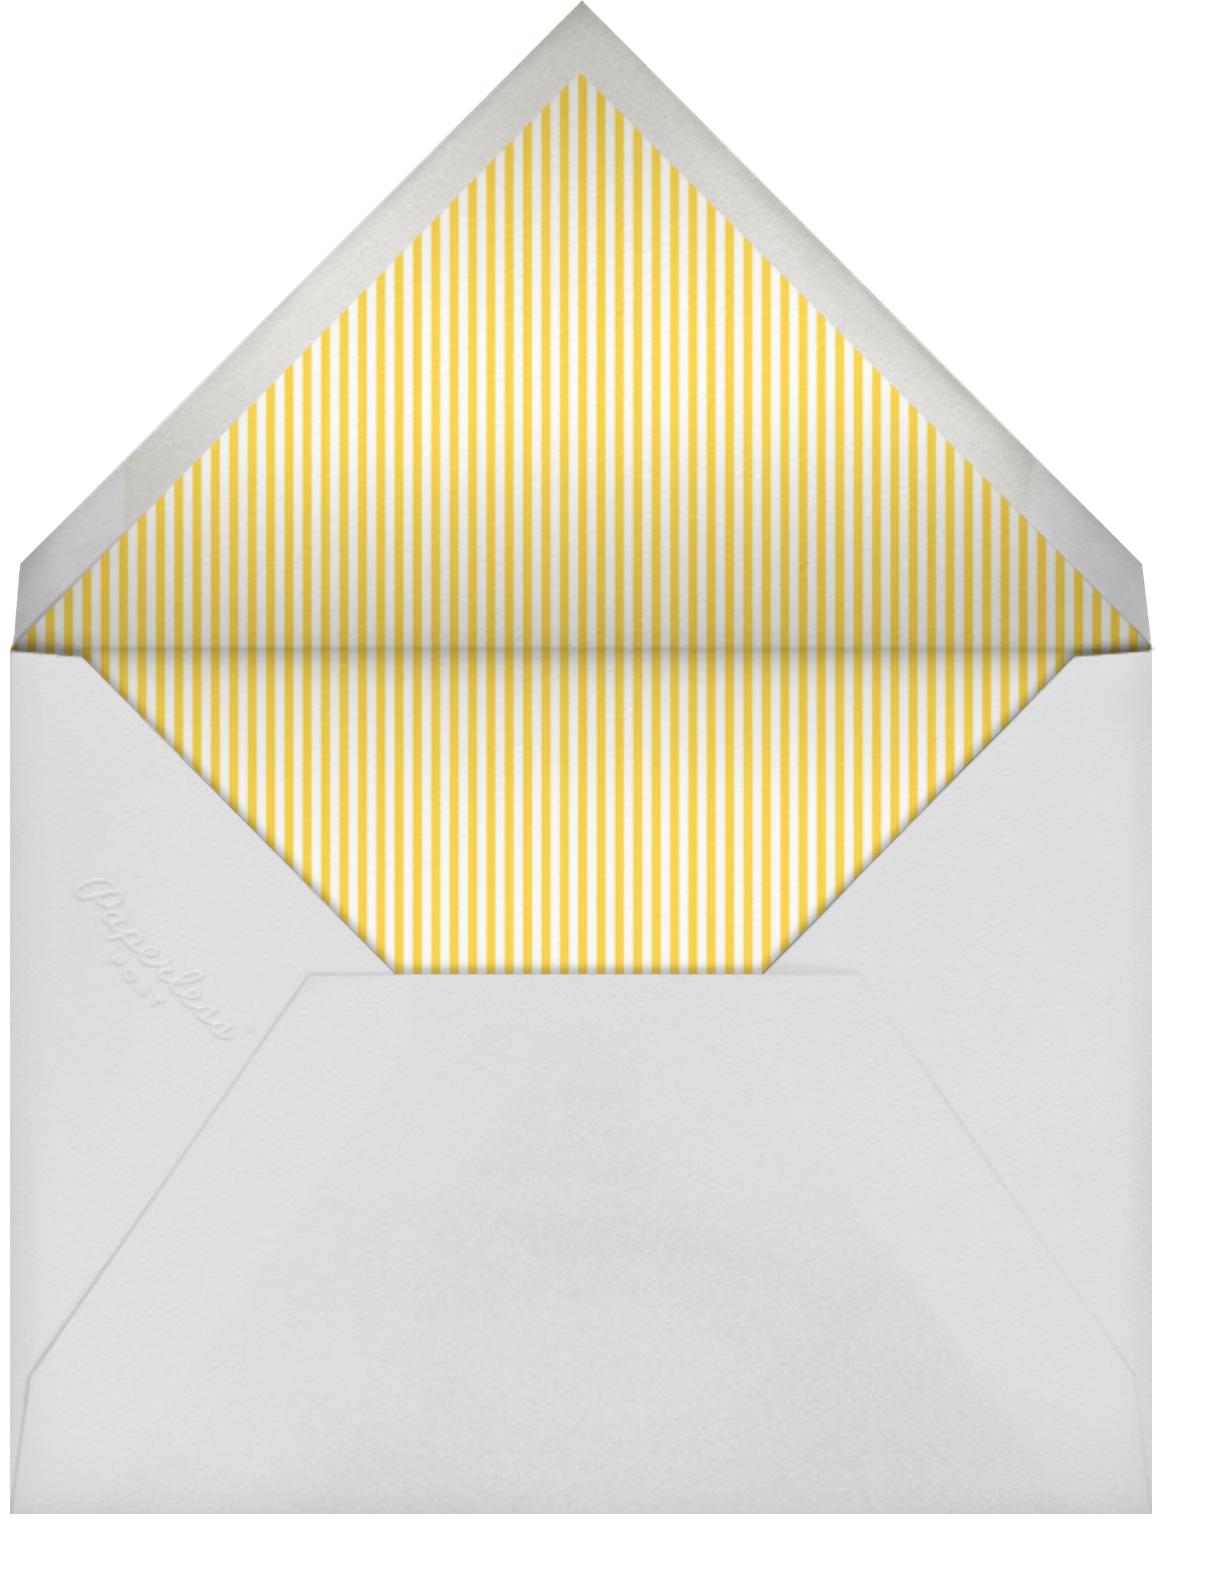 City Mouse - Little Cube - Kids' birthday - envelope back